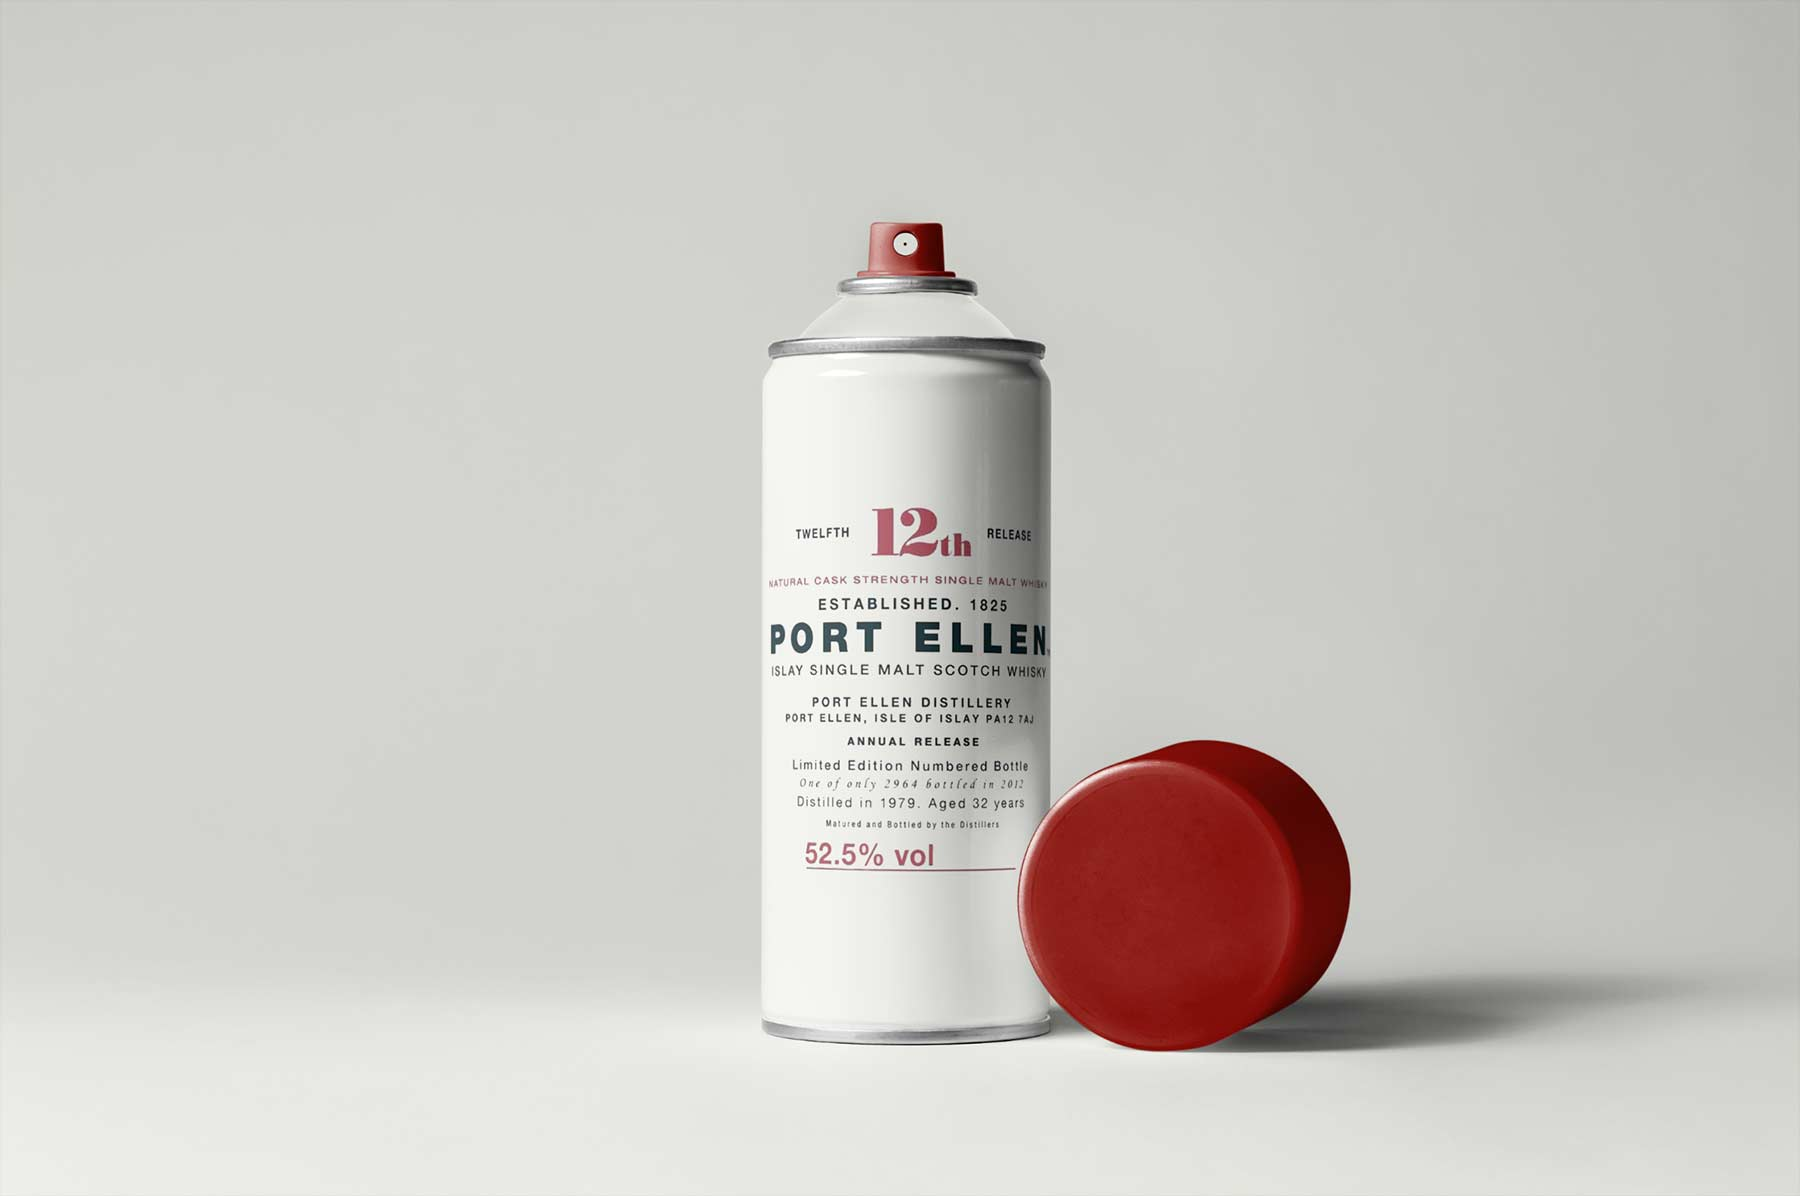 Luxus-Spraydosen Nouveau-Riche-luxus-farbdosen_03